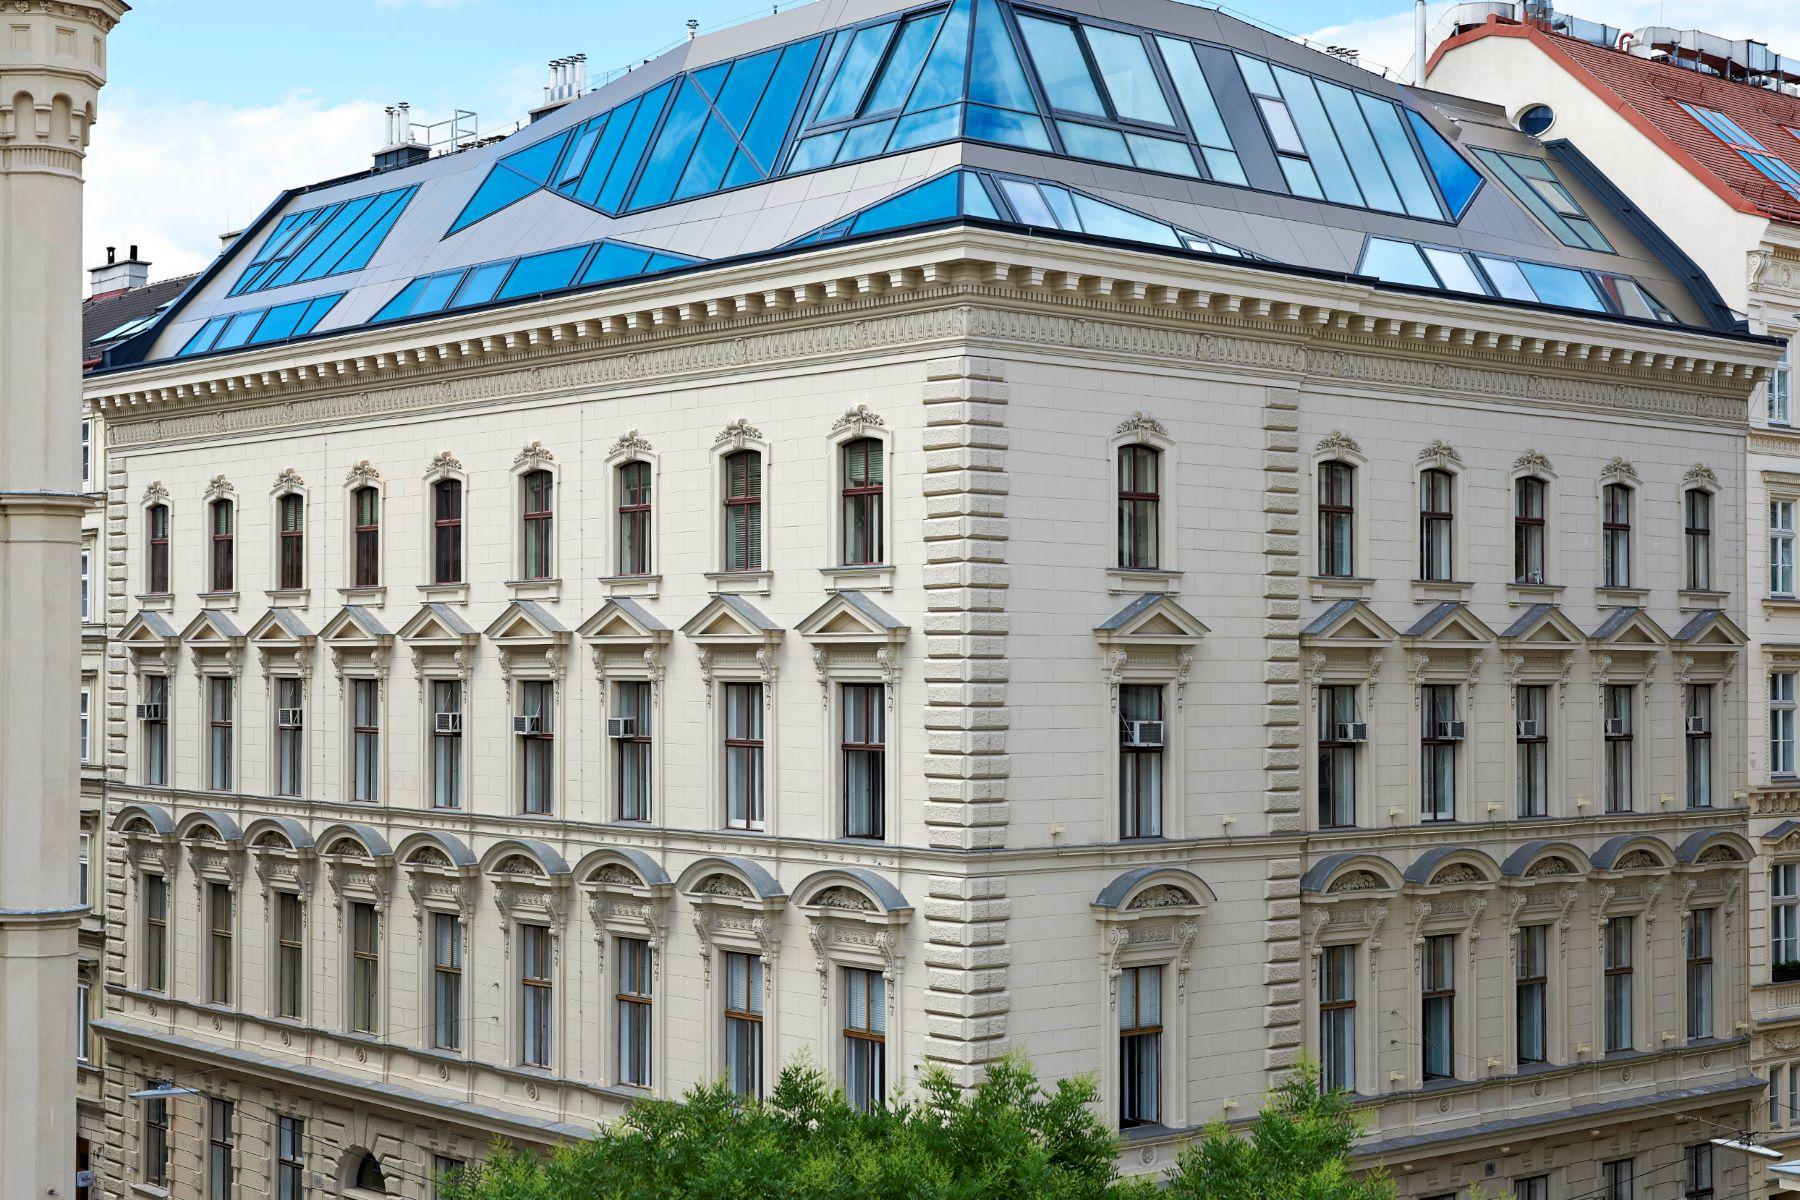 Квартира для того Продажа на Stunning Penthouse Vienna, Vienna, 1010 Austria